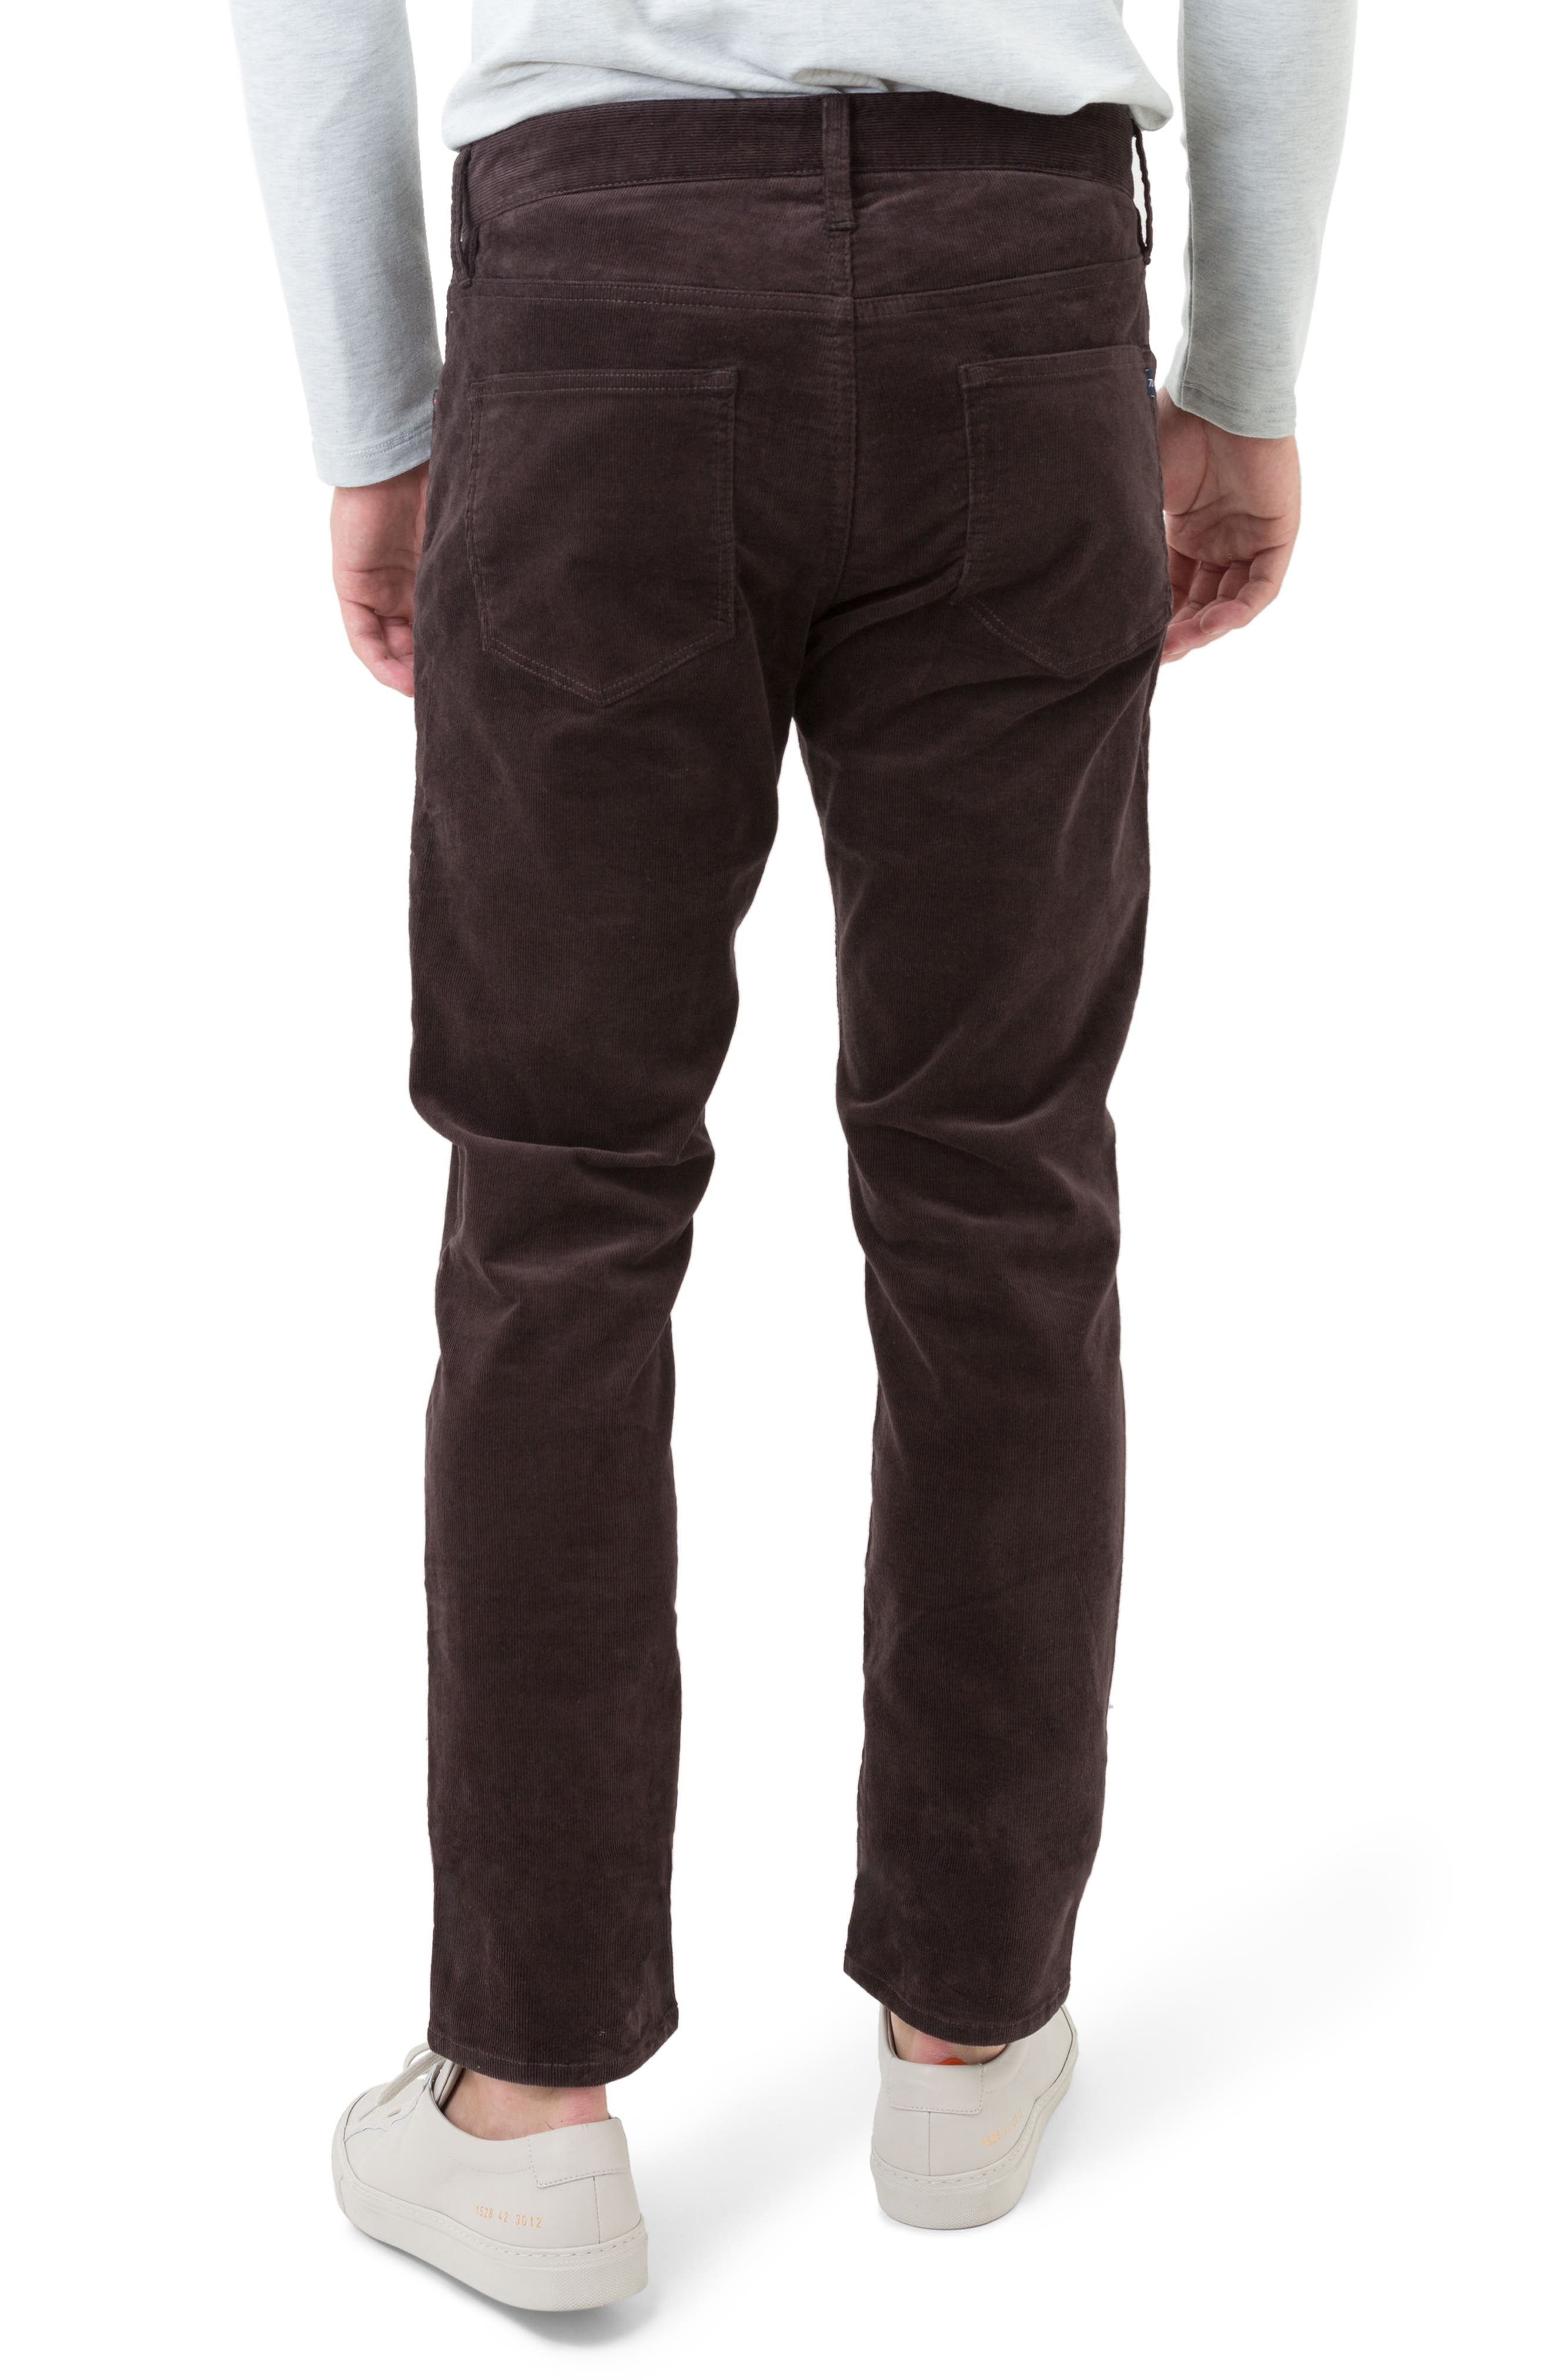 Courtland Slim Fit Corduroy Pants,                             Alternate thumbnail 2, color,                             MOCHA BROWN